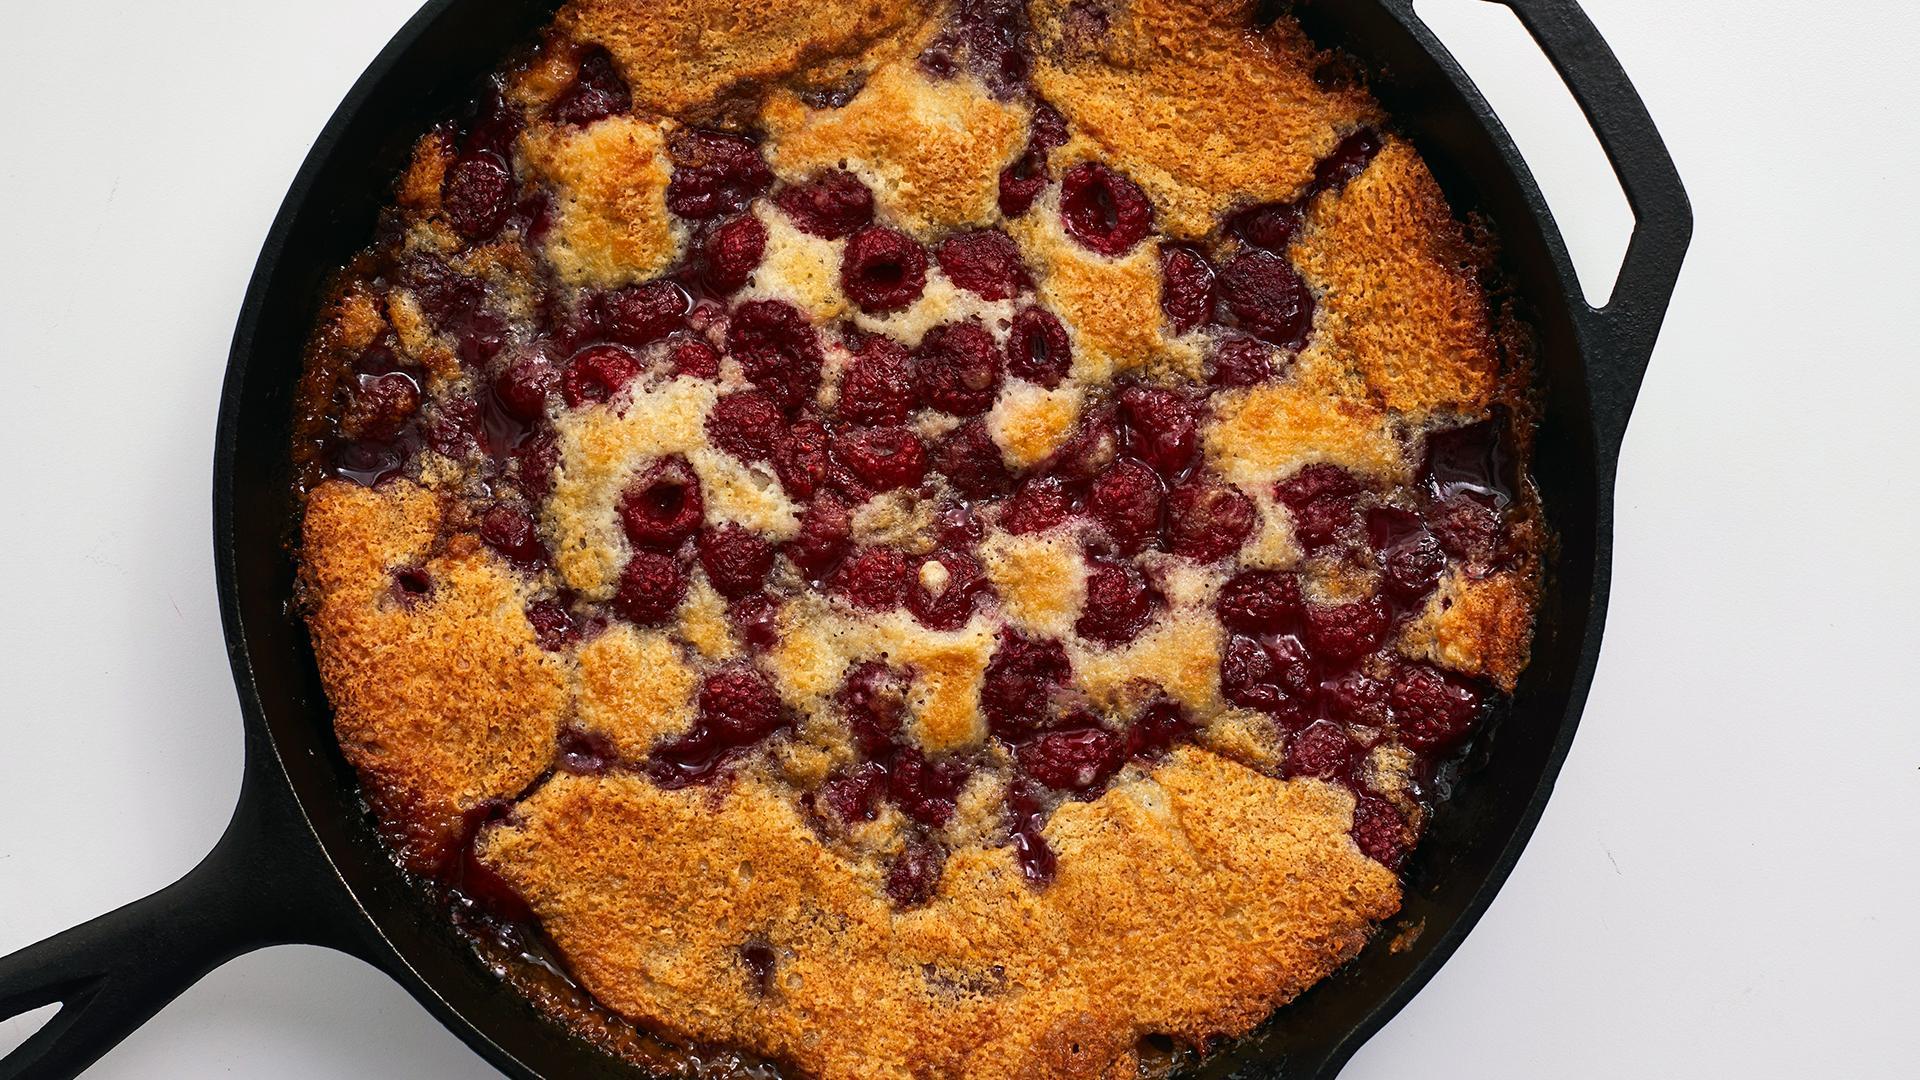 How to Make Raspberry Cobbler